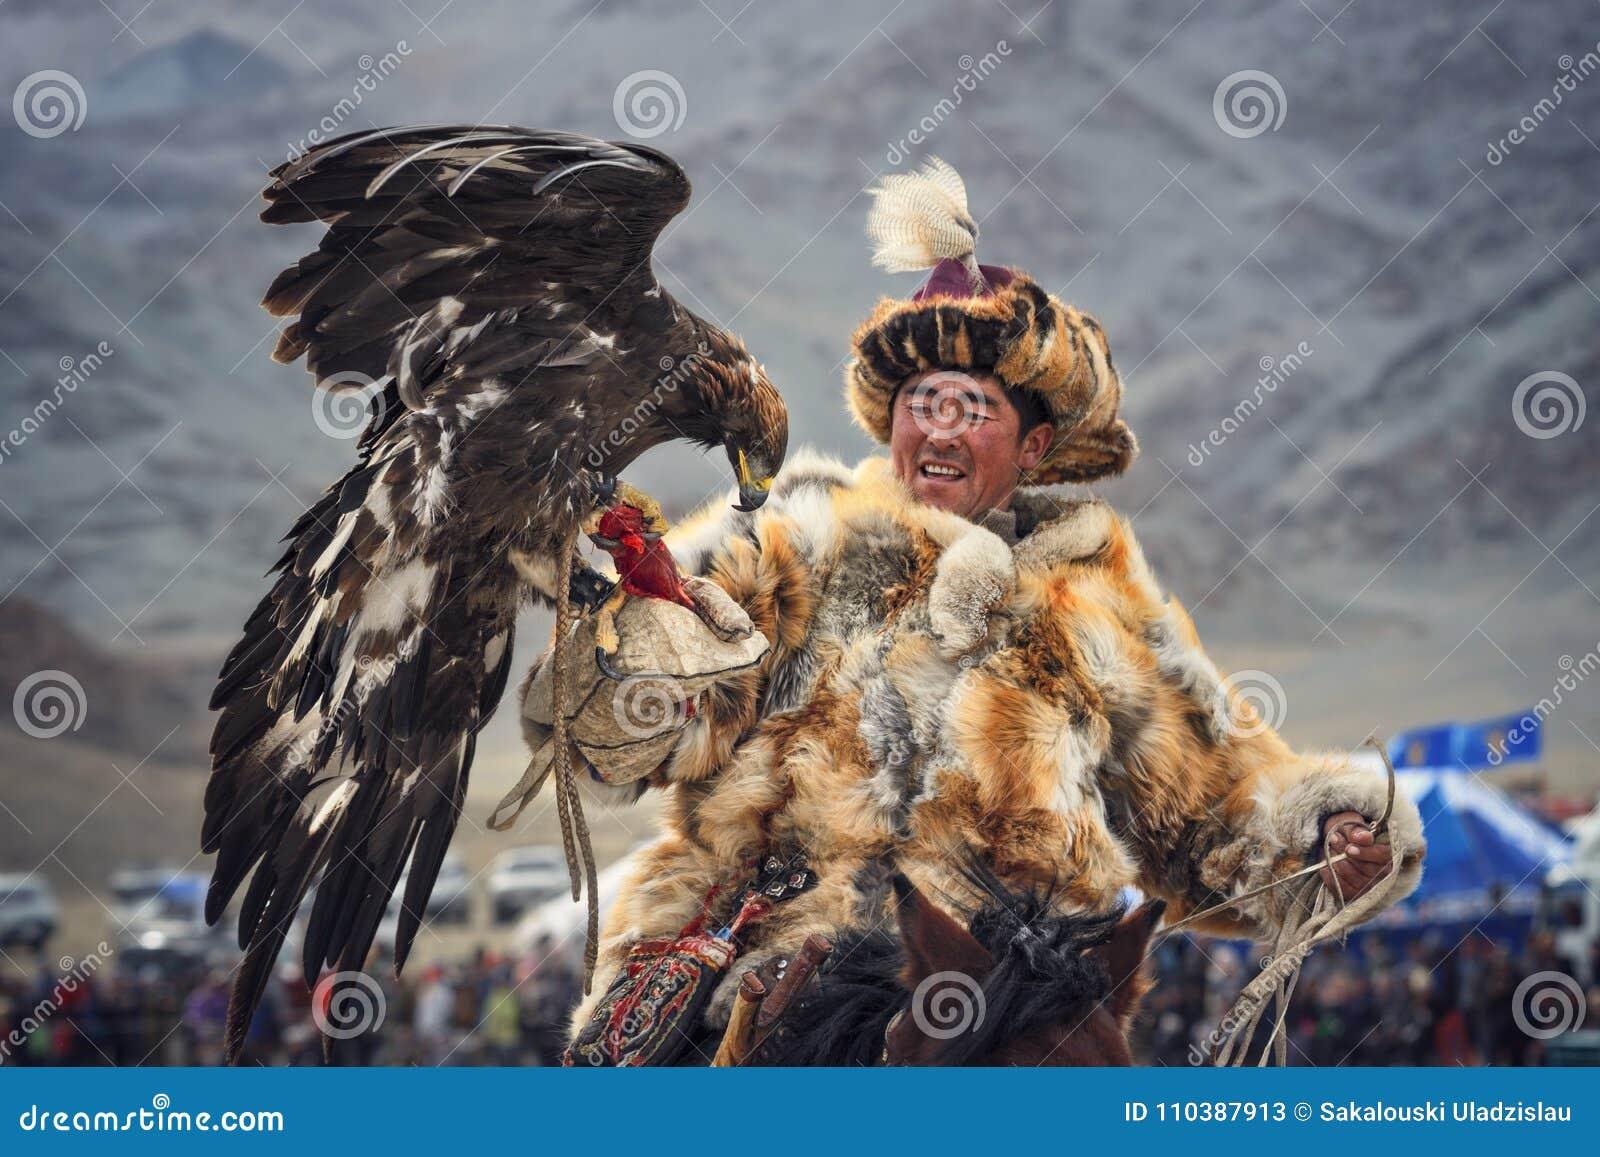 Mongolië Traditioneel Gouden Eagle Festival Onbekend Mongools Hunter Berkutchi On Horse With Gouden Eagle Valkerij in het Westen